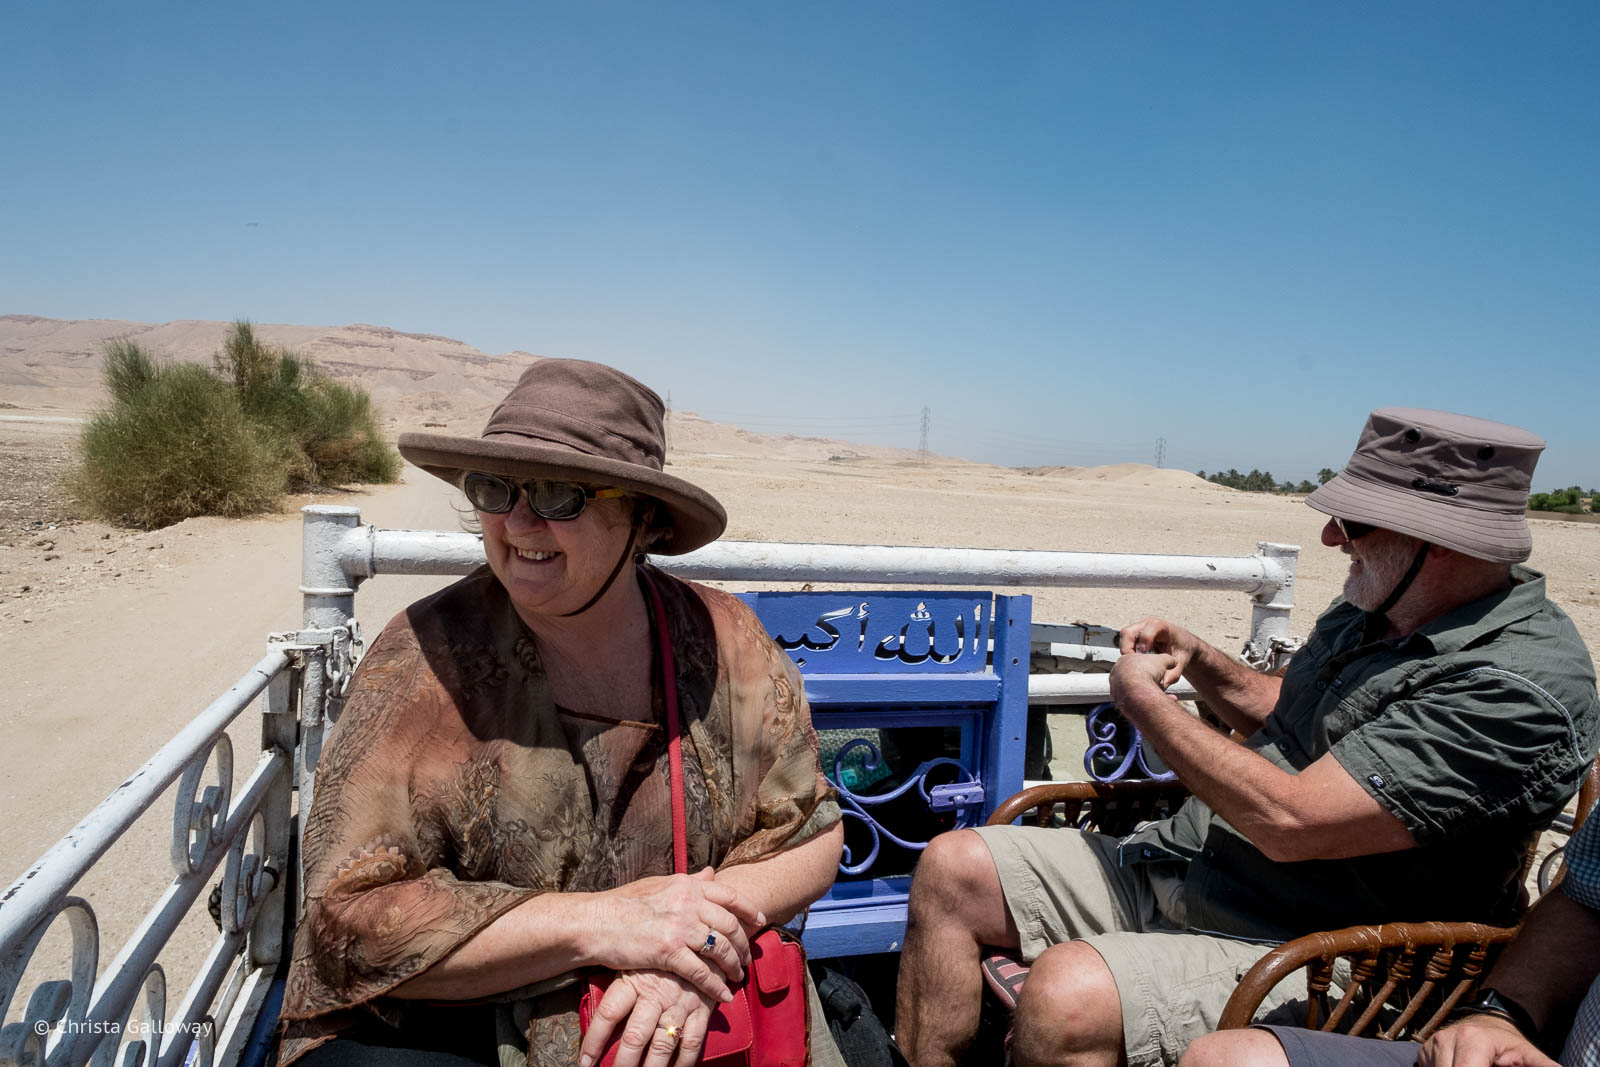 desert-monastary-luxor-ckgalloway-3516.jpg